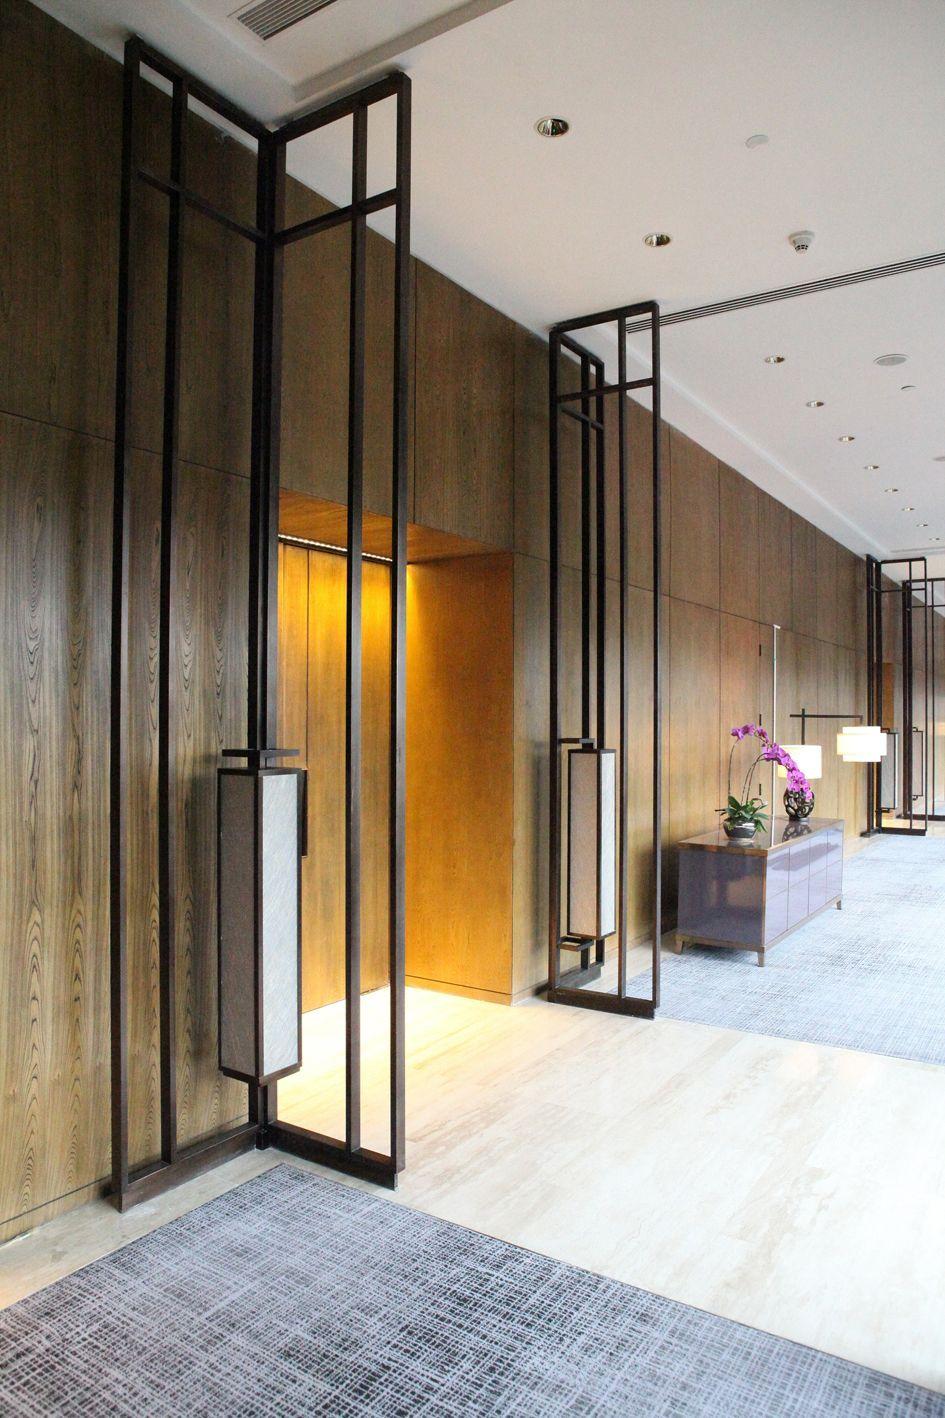 Pin by pascal ornelis on slaapkamers pinterest lobbies corridor